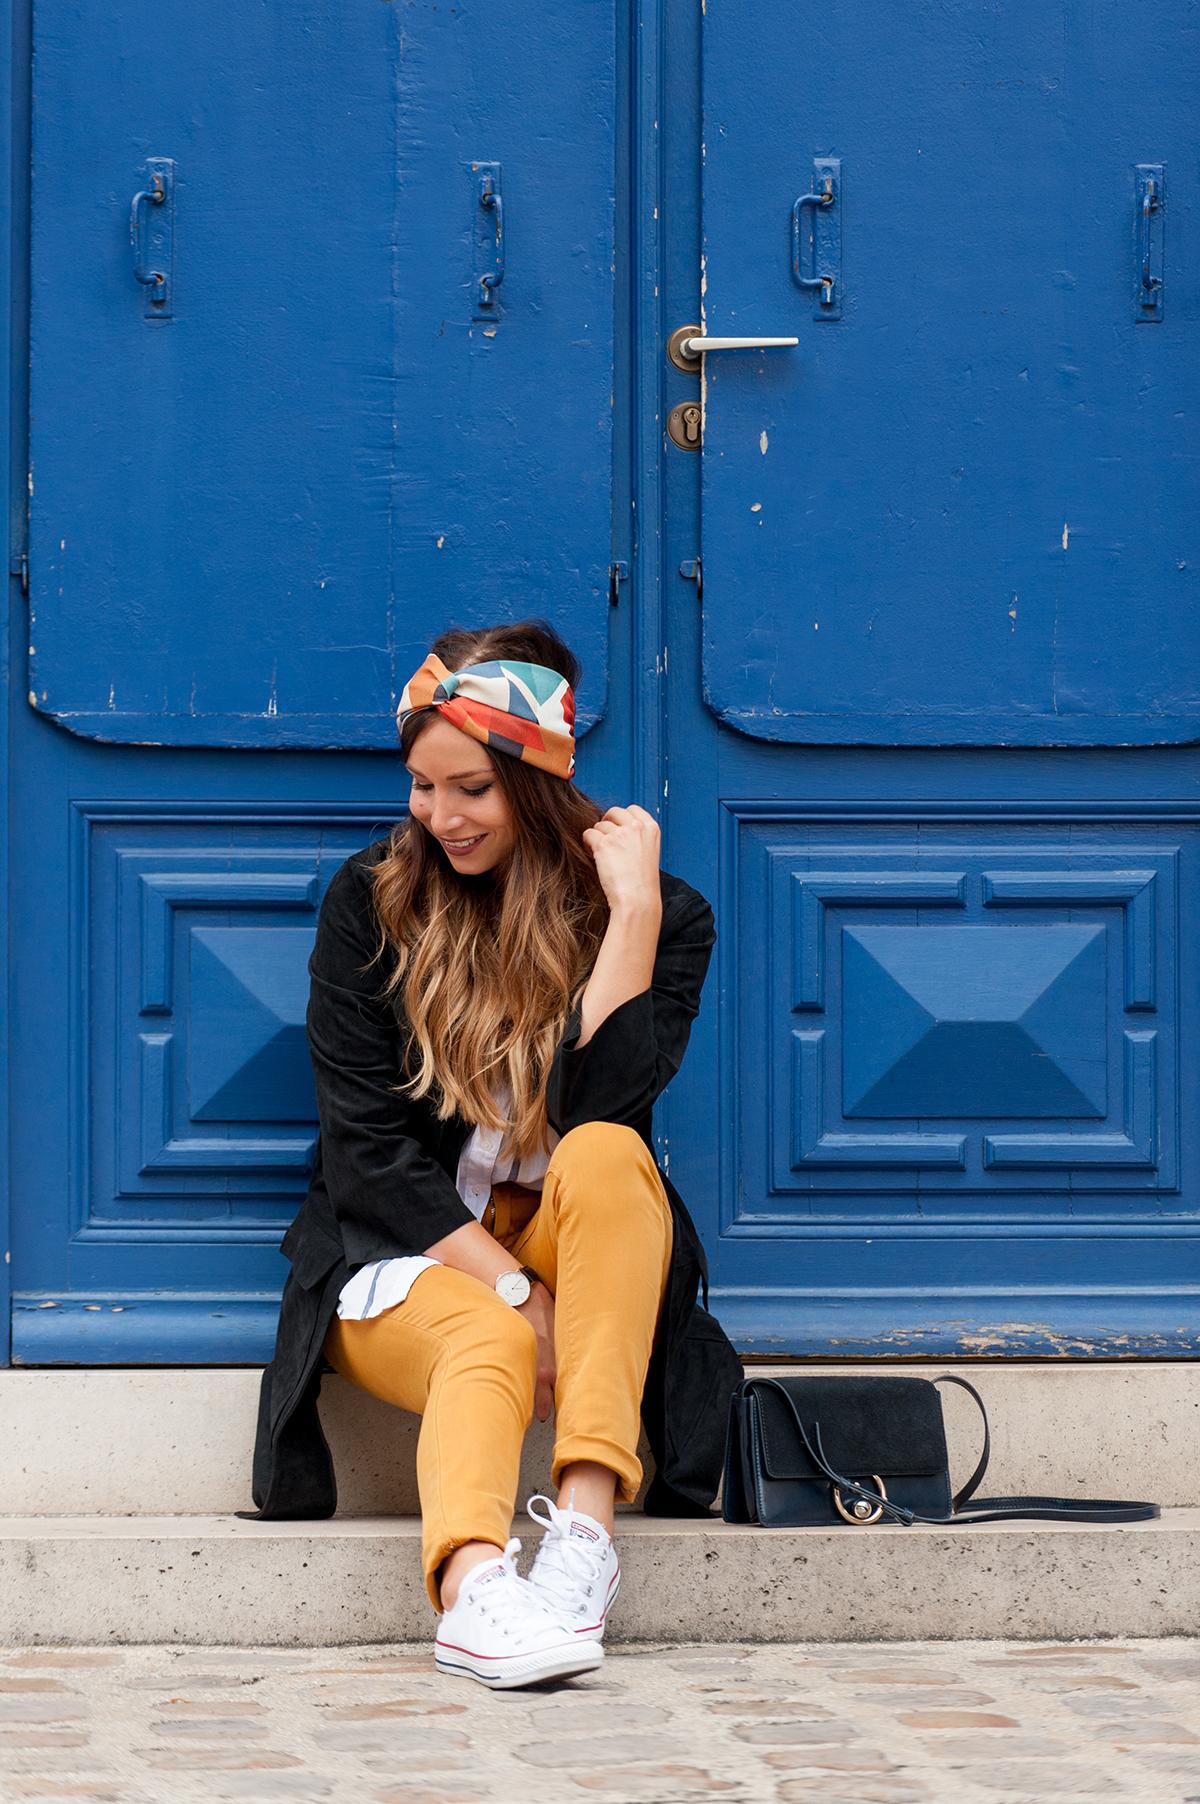 blue door fashion blog